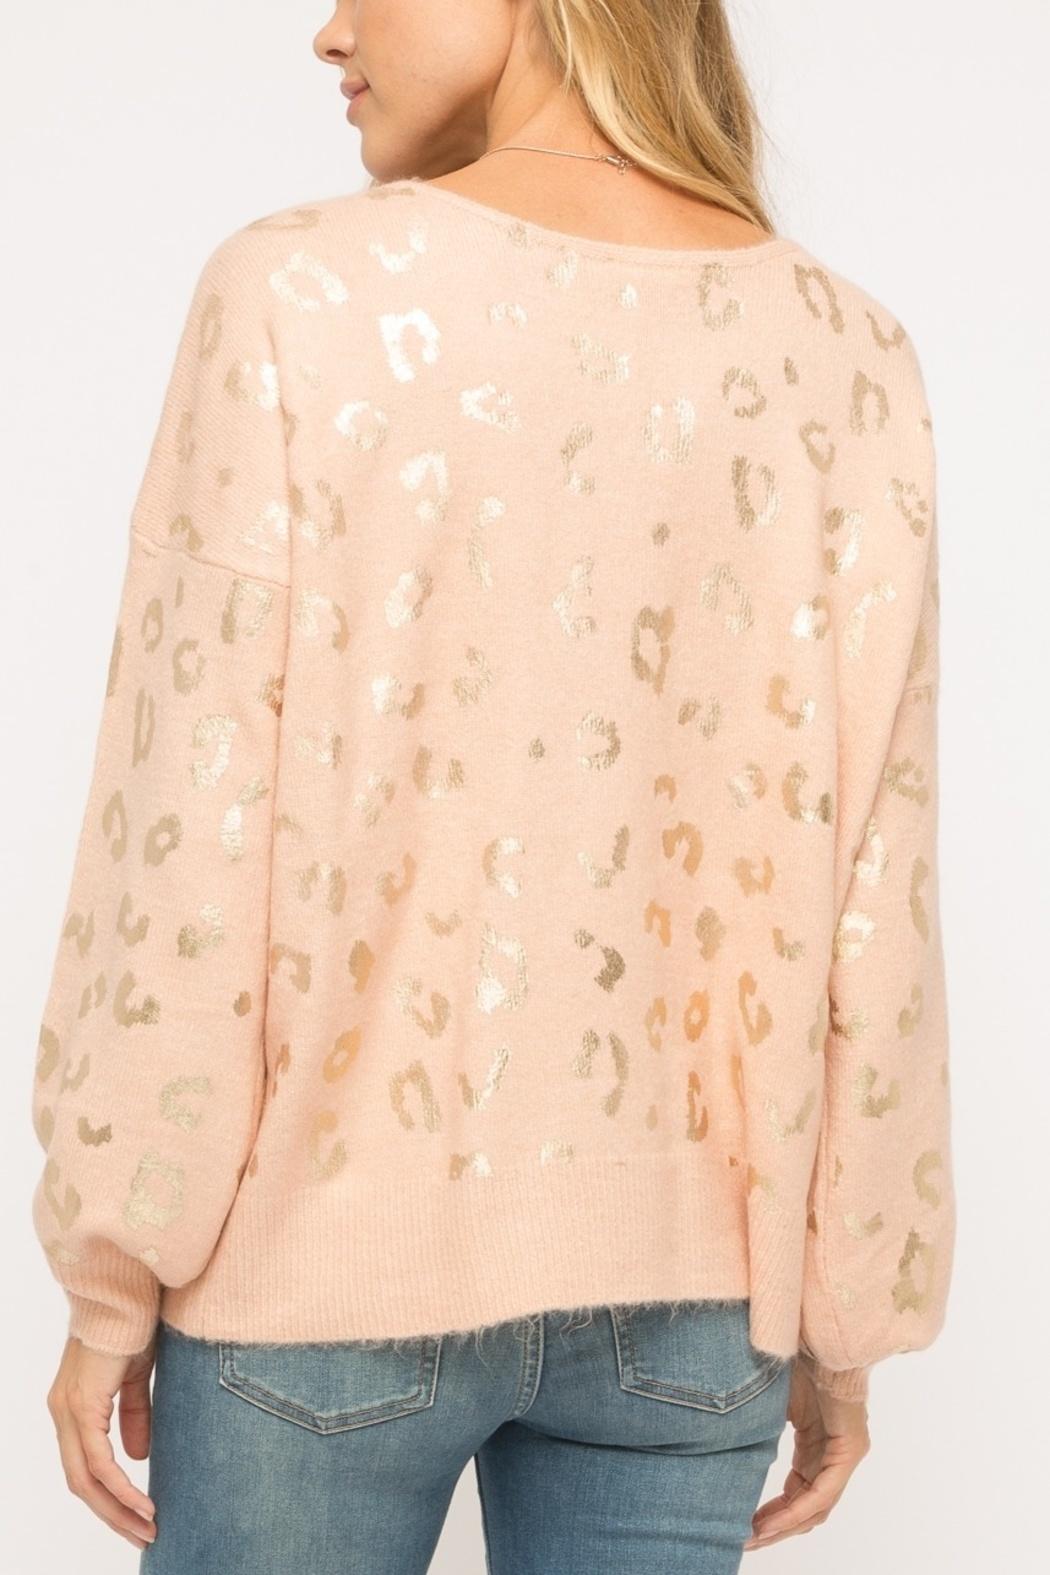 The Cate Leopard Sweater